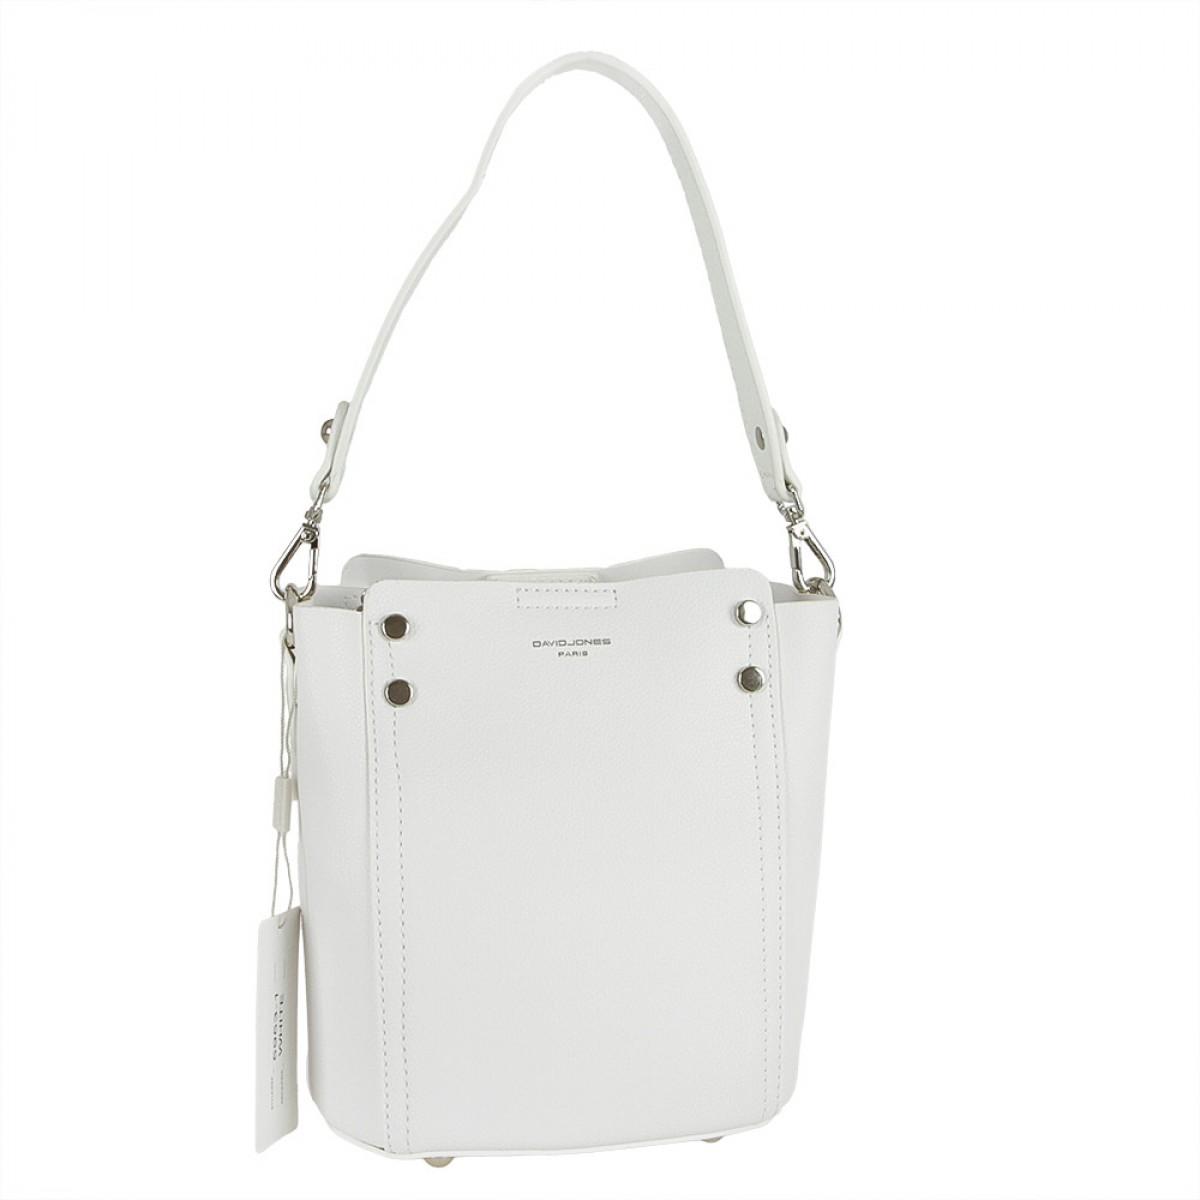 Жіноча сумка David Jones 5953-1 WHITE